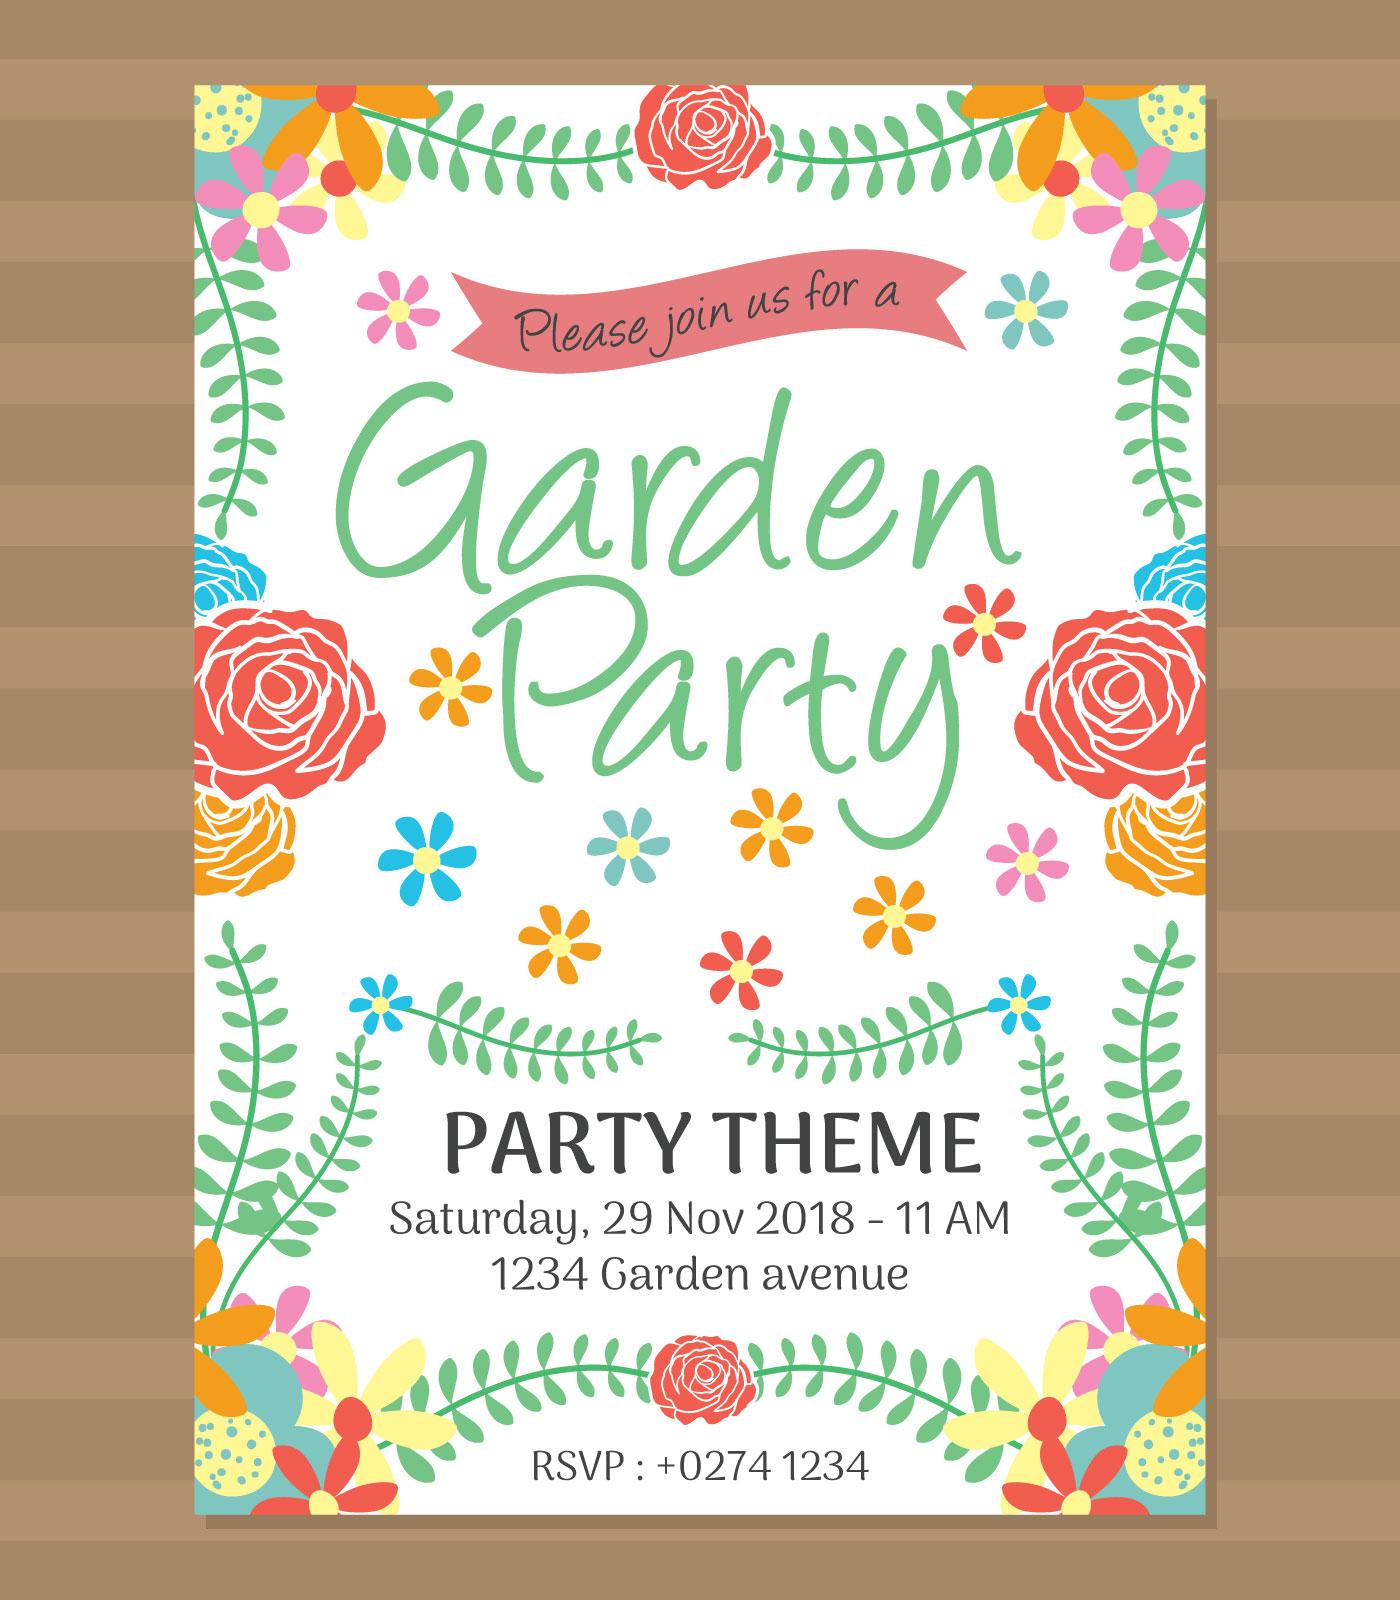 Garden Party Invitation Free Vector Art - (11604 Free Downloads)